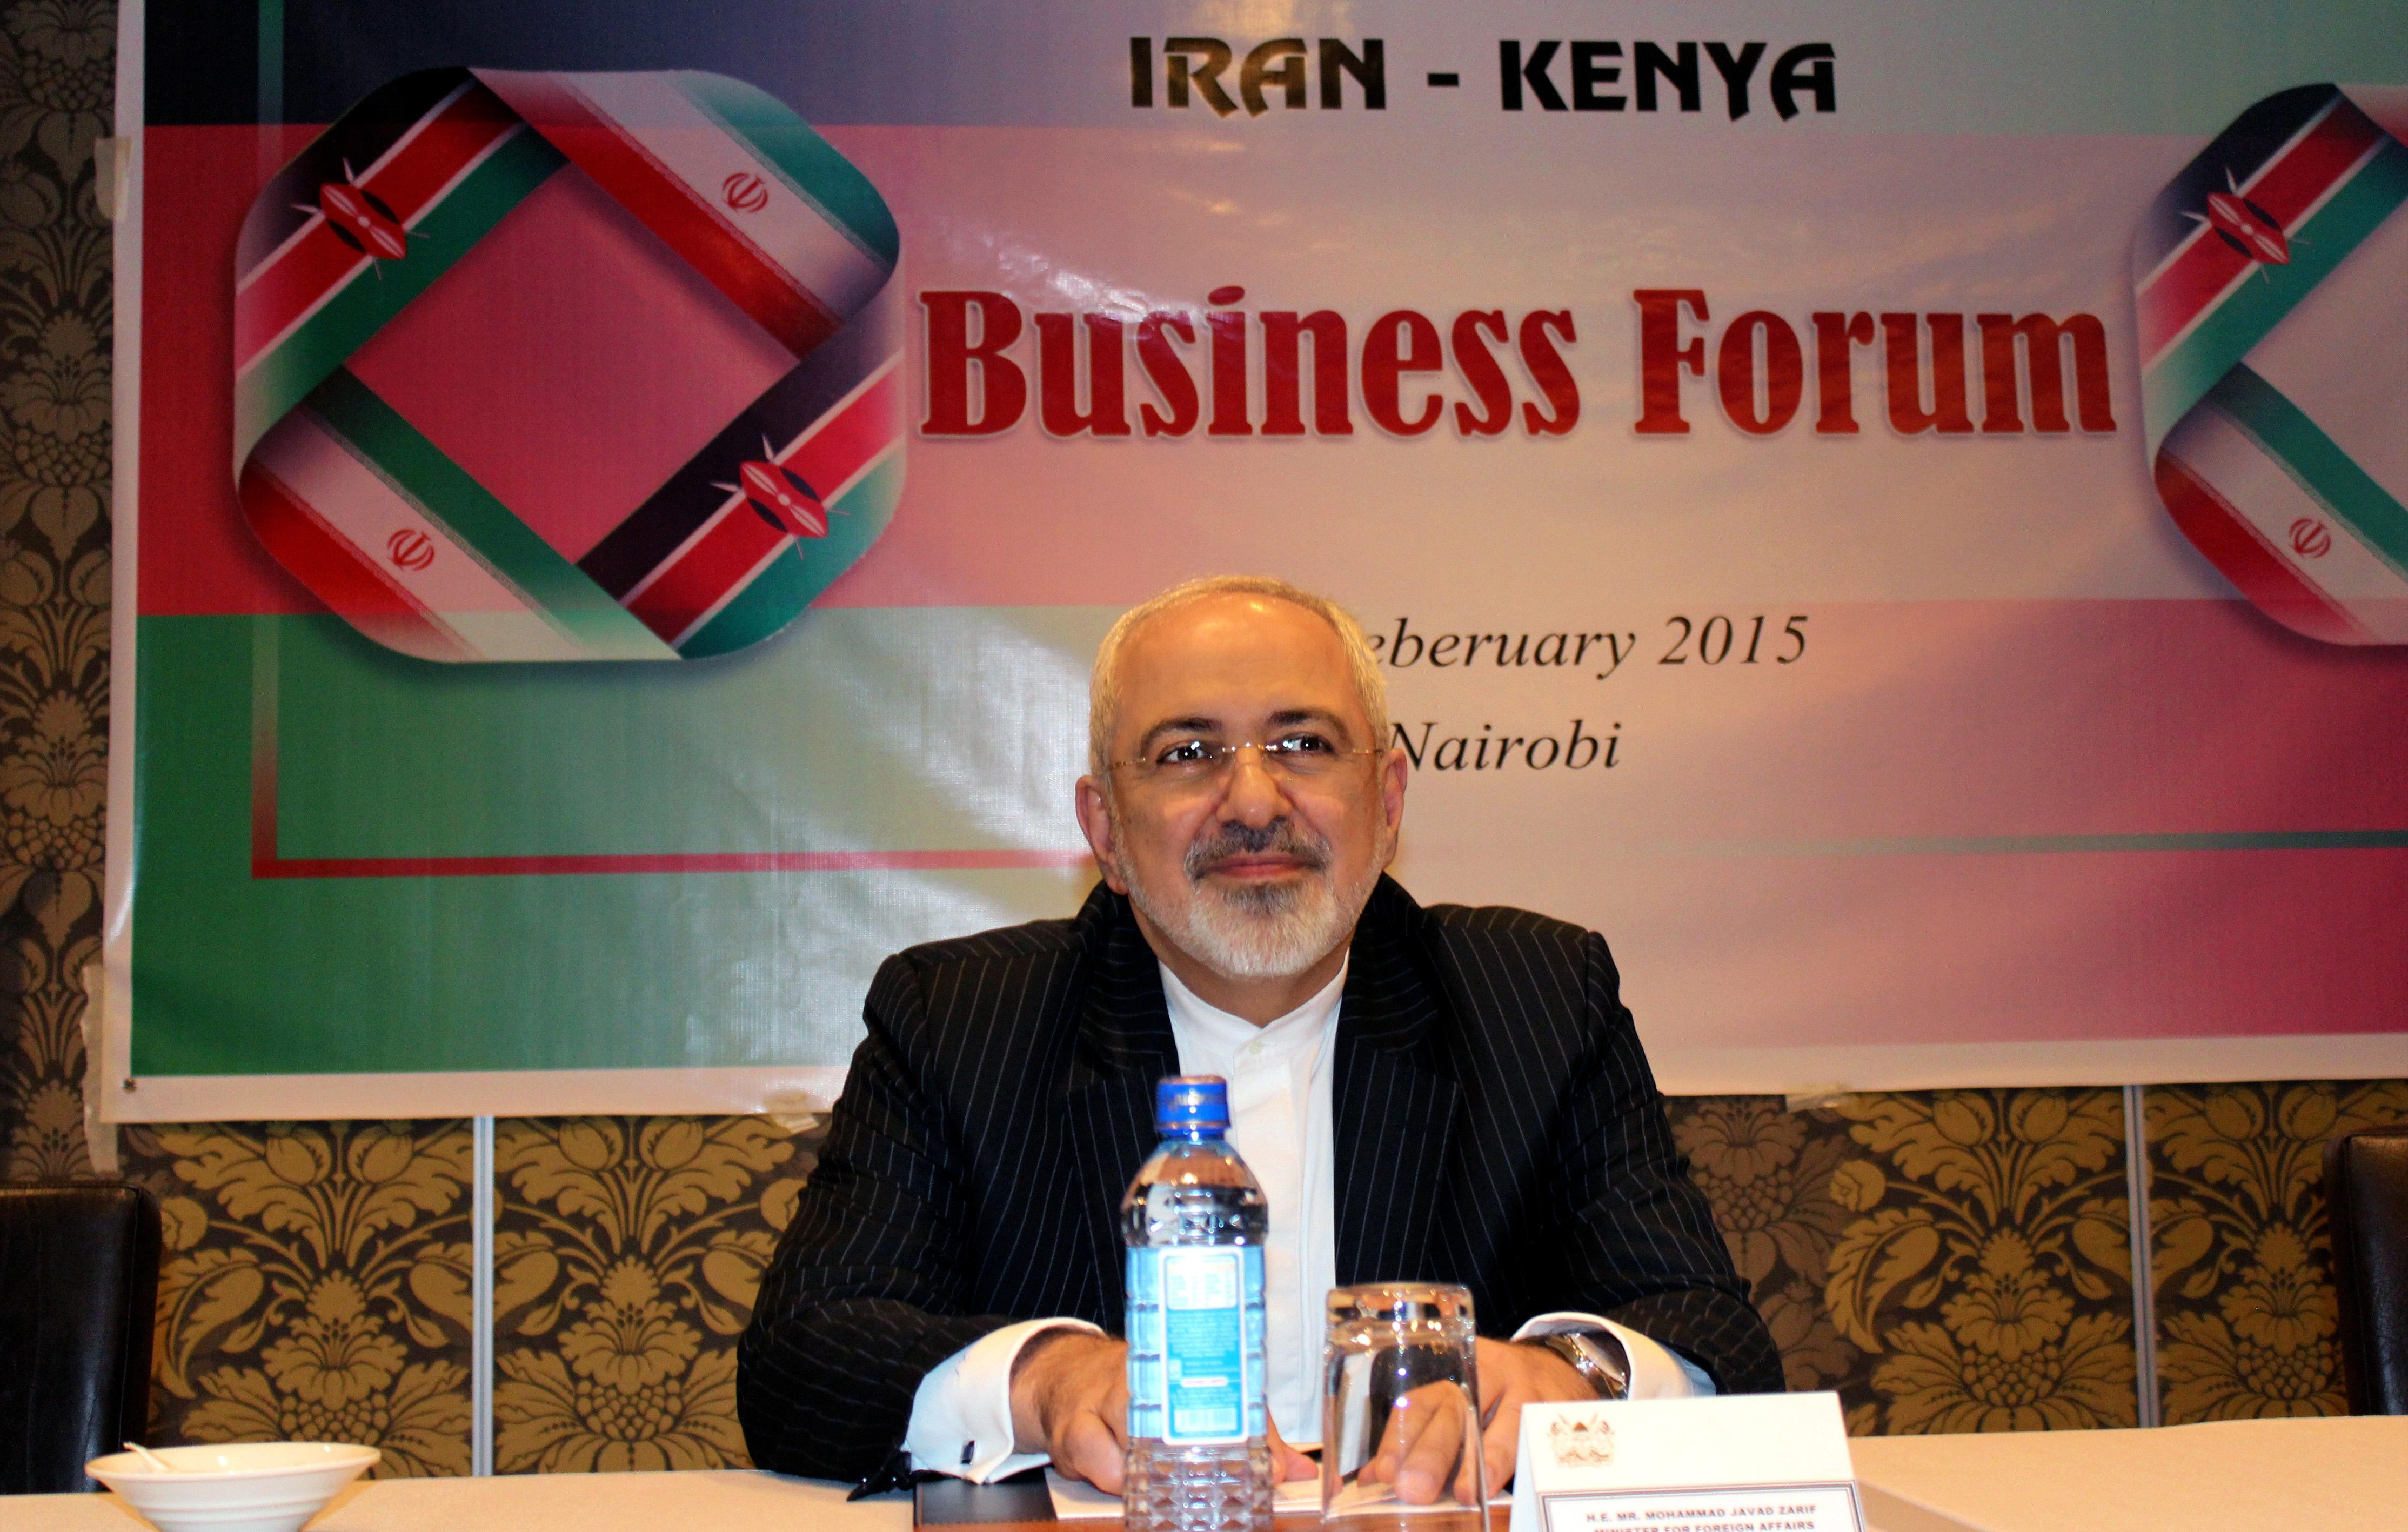 Iranian Foreign Minister Mohammad Javad Zarif attends Iran-Kenya business forum in Nairobi, Kenya on Feb. 2, 2015.